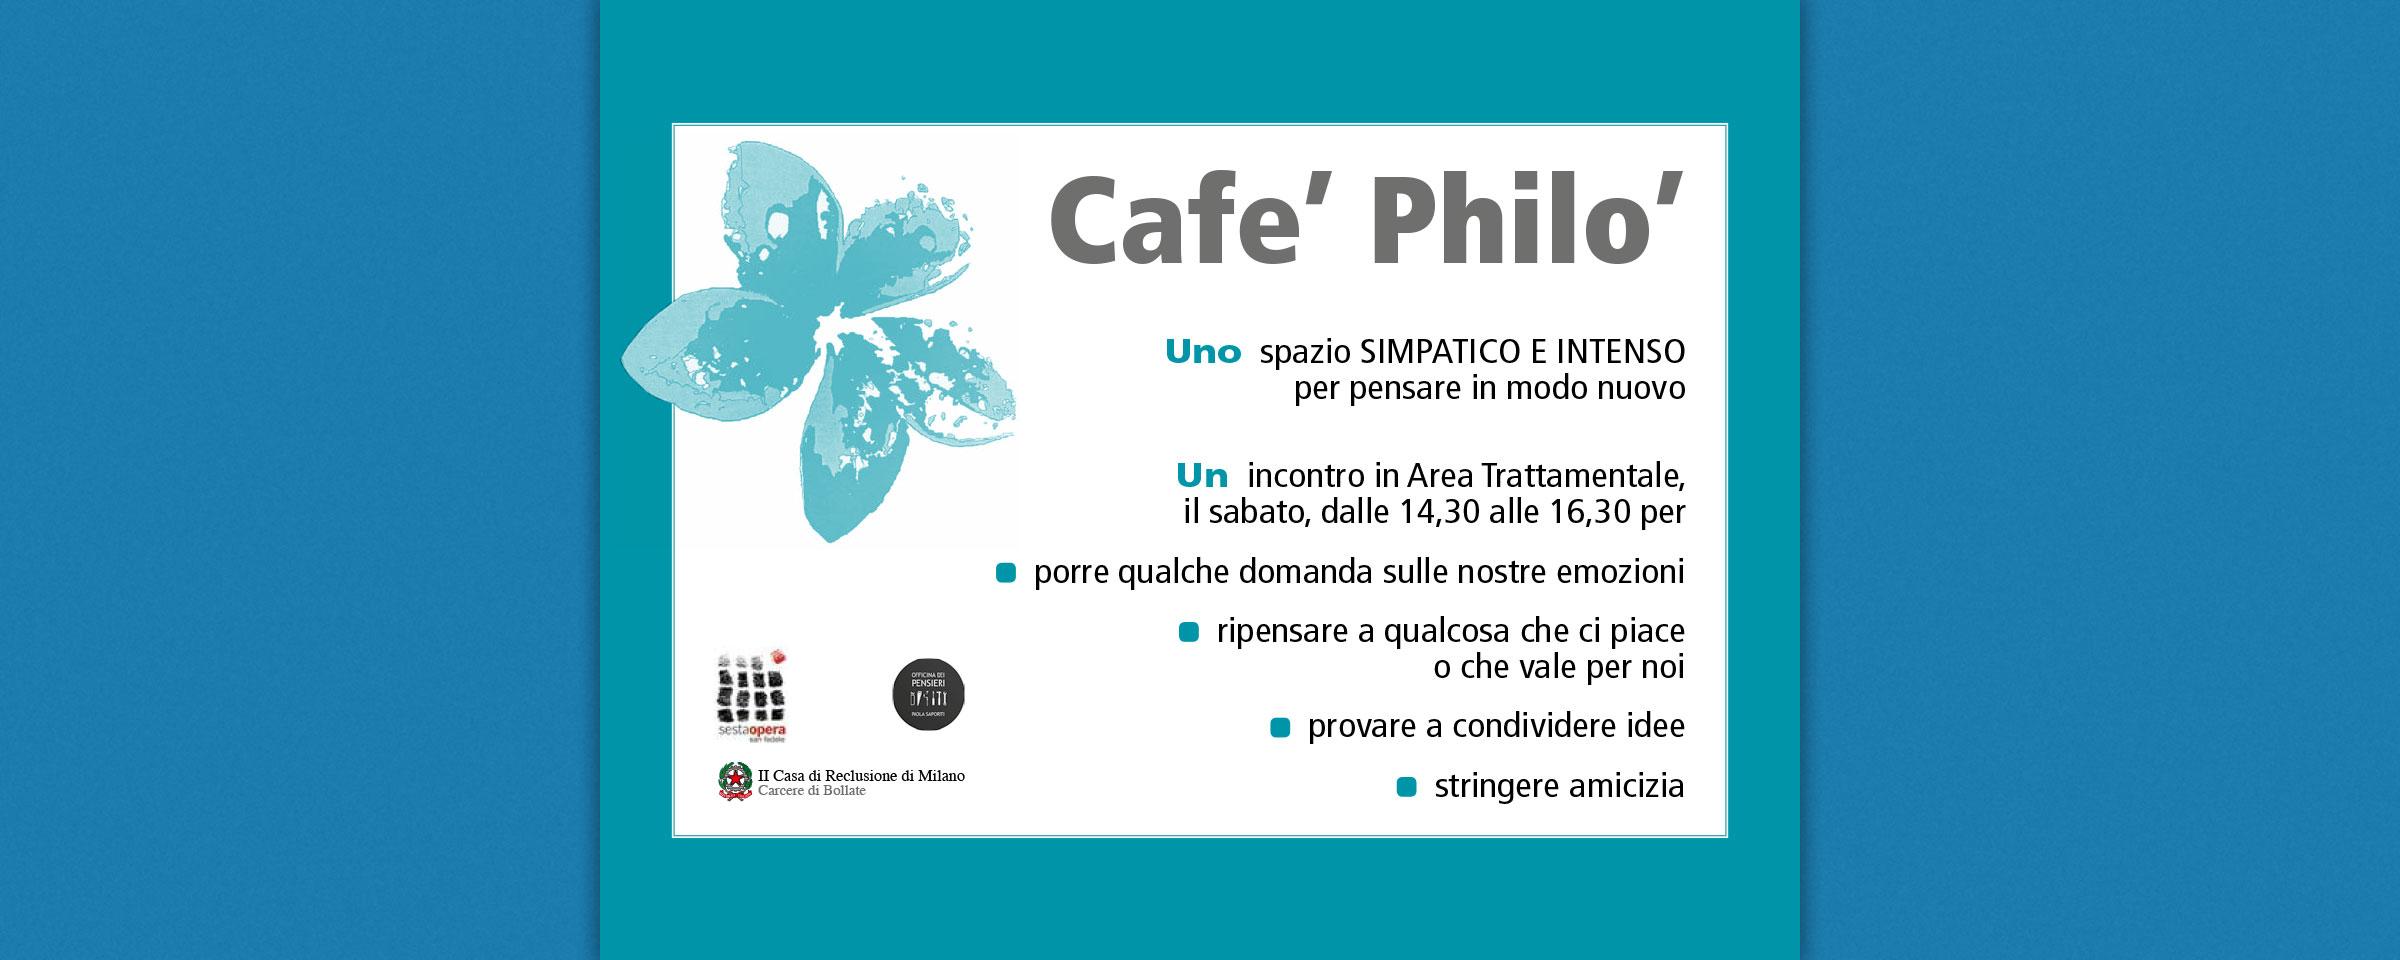 cafe_philo_bollate